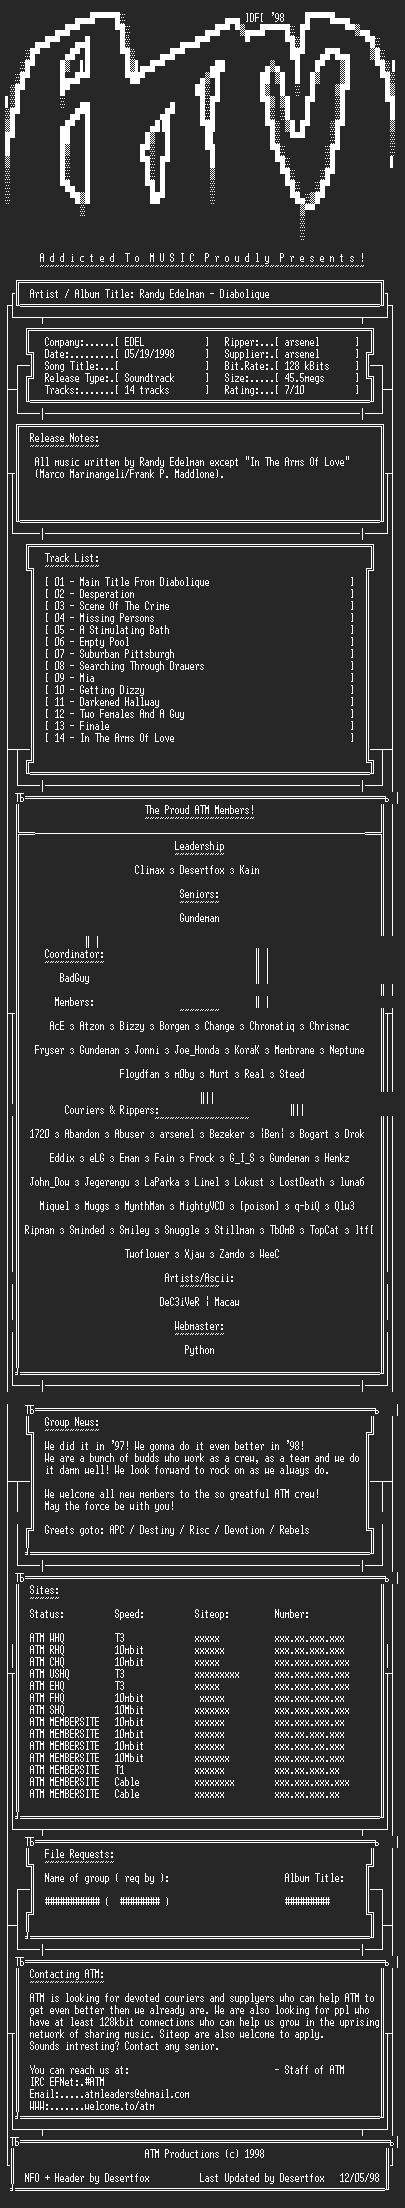 NFO file for Randy_Edelman_-_Diabolique_(1996)_-_ATM